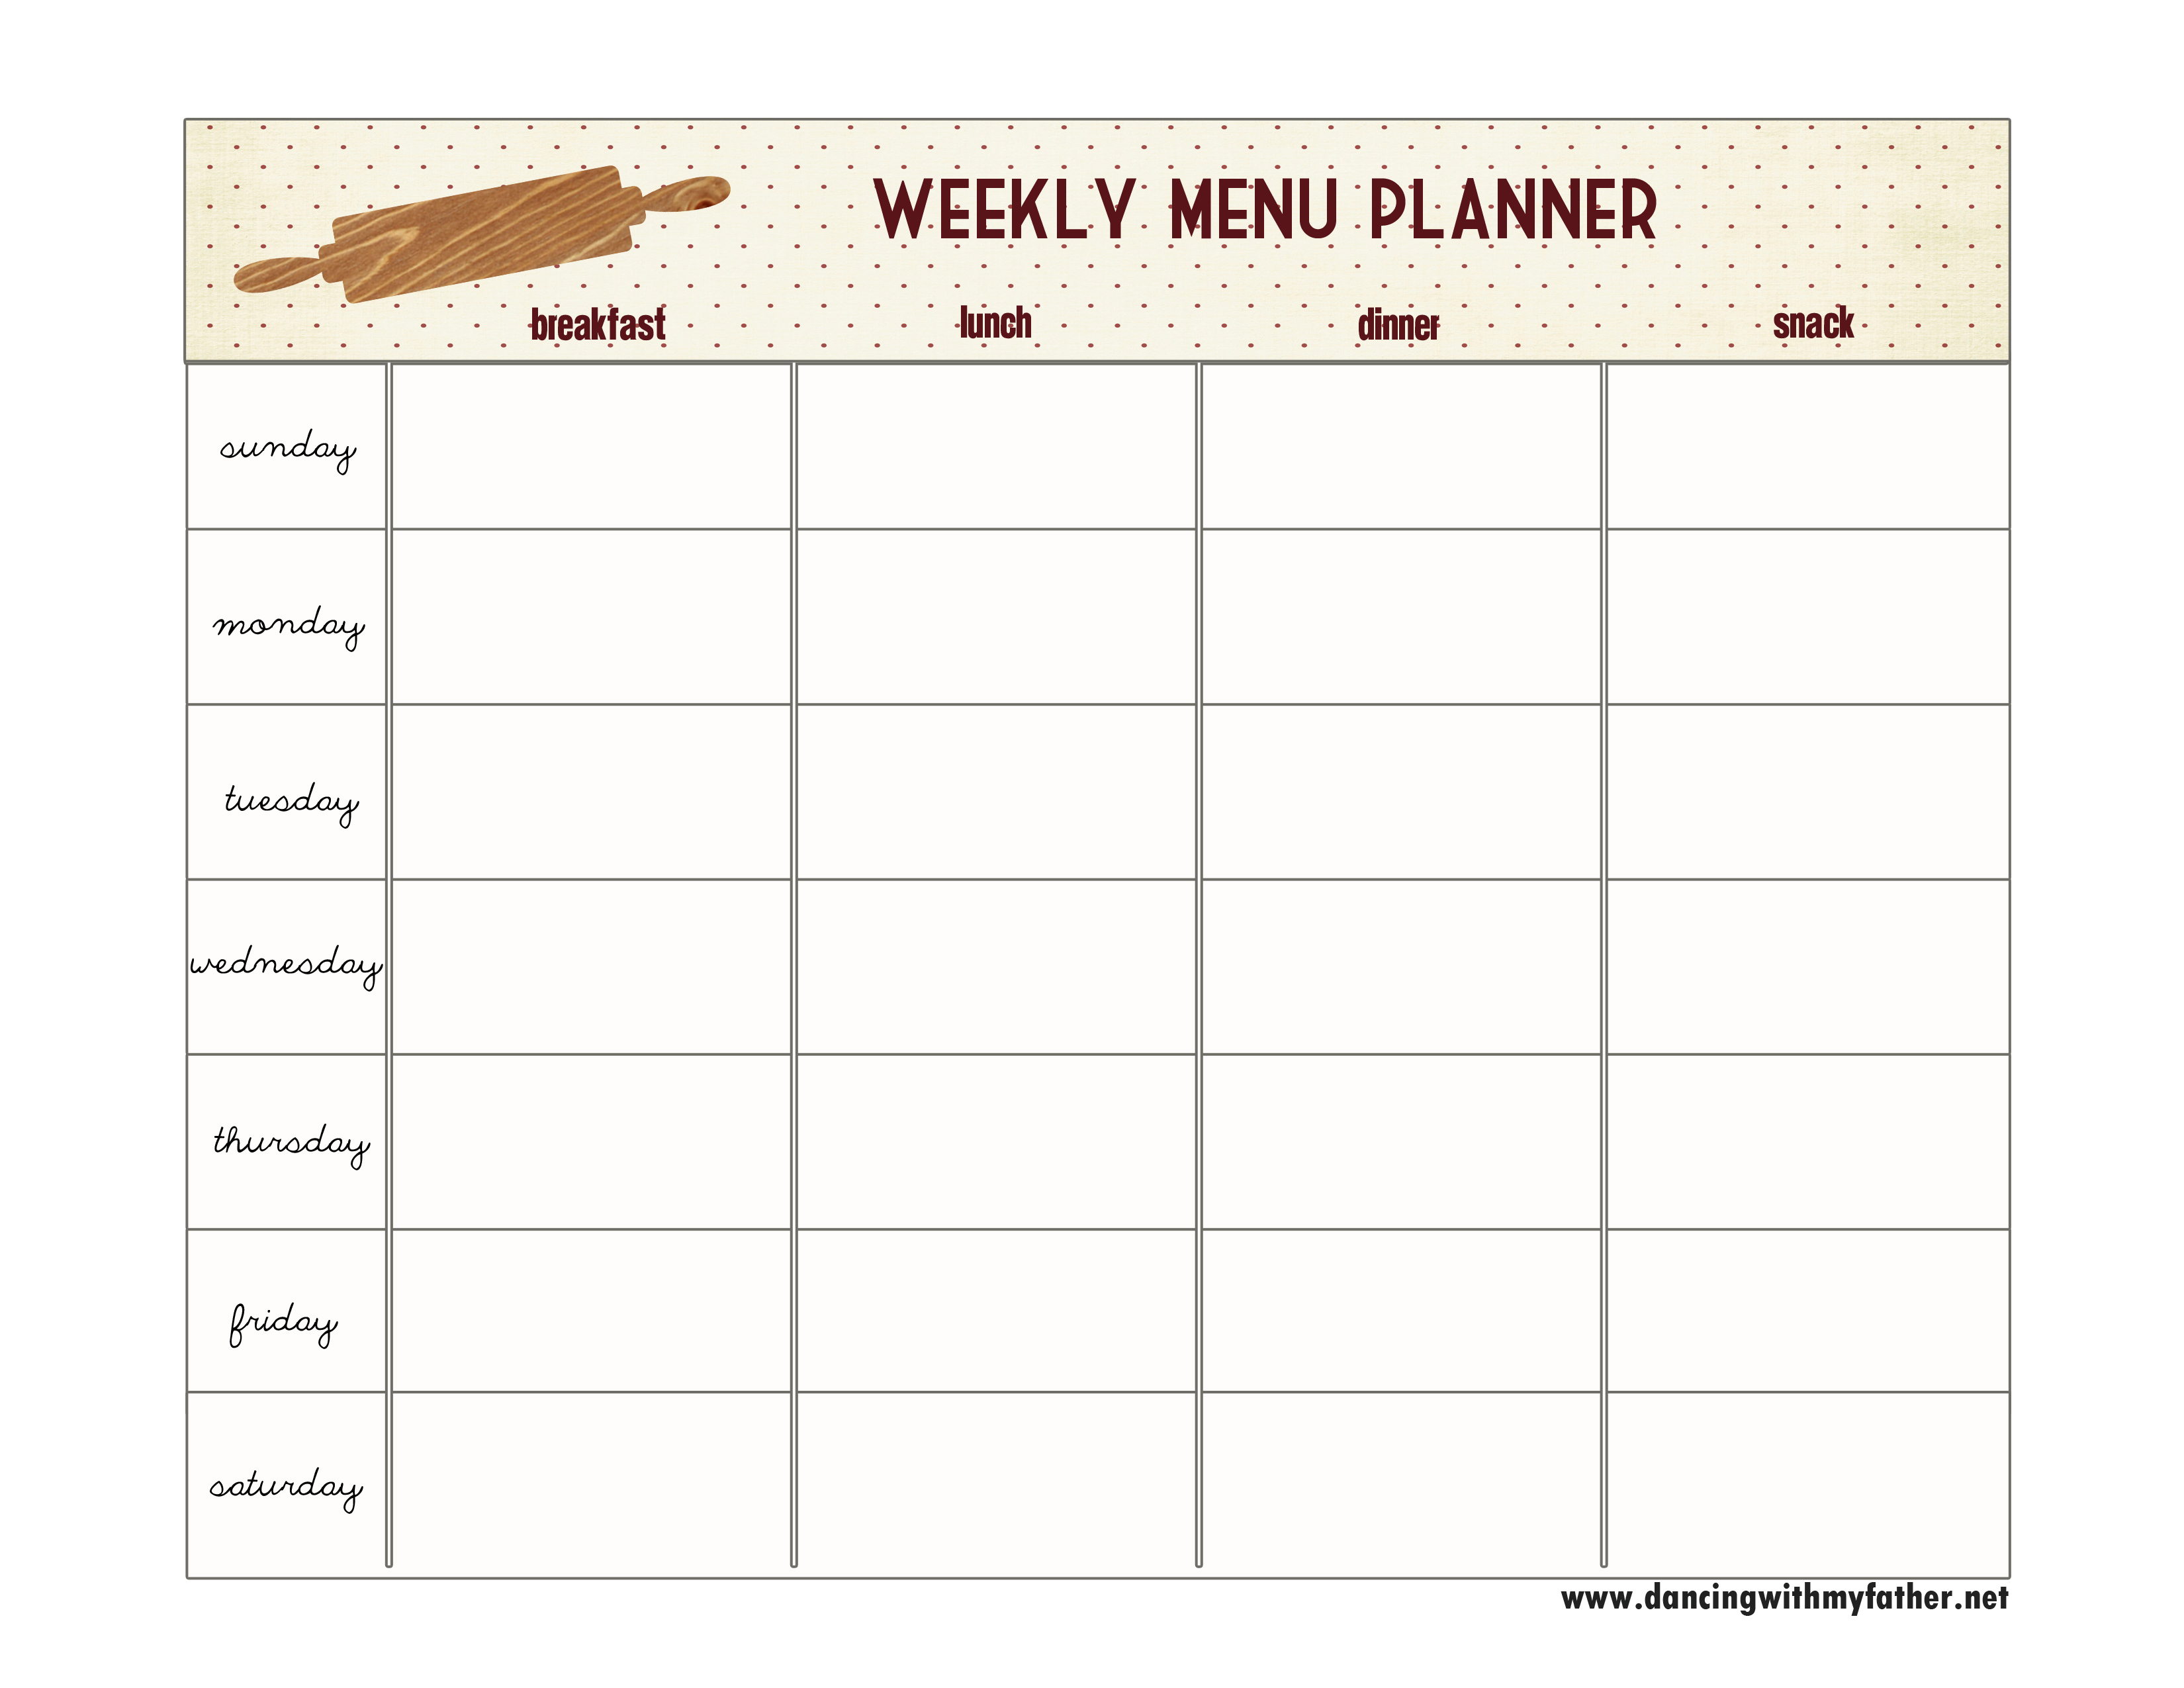 One Step Toward Organized {Free Printable Menu Planner} | Dancing - Free Printable Menu